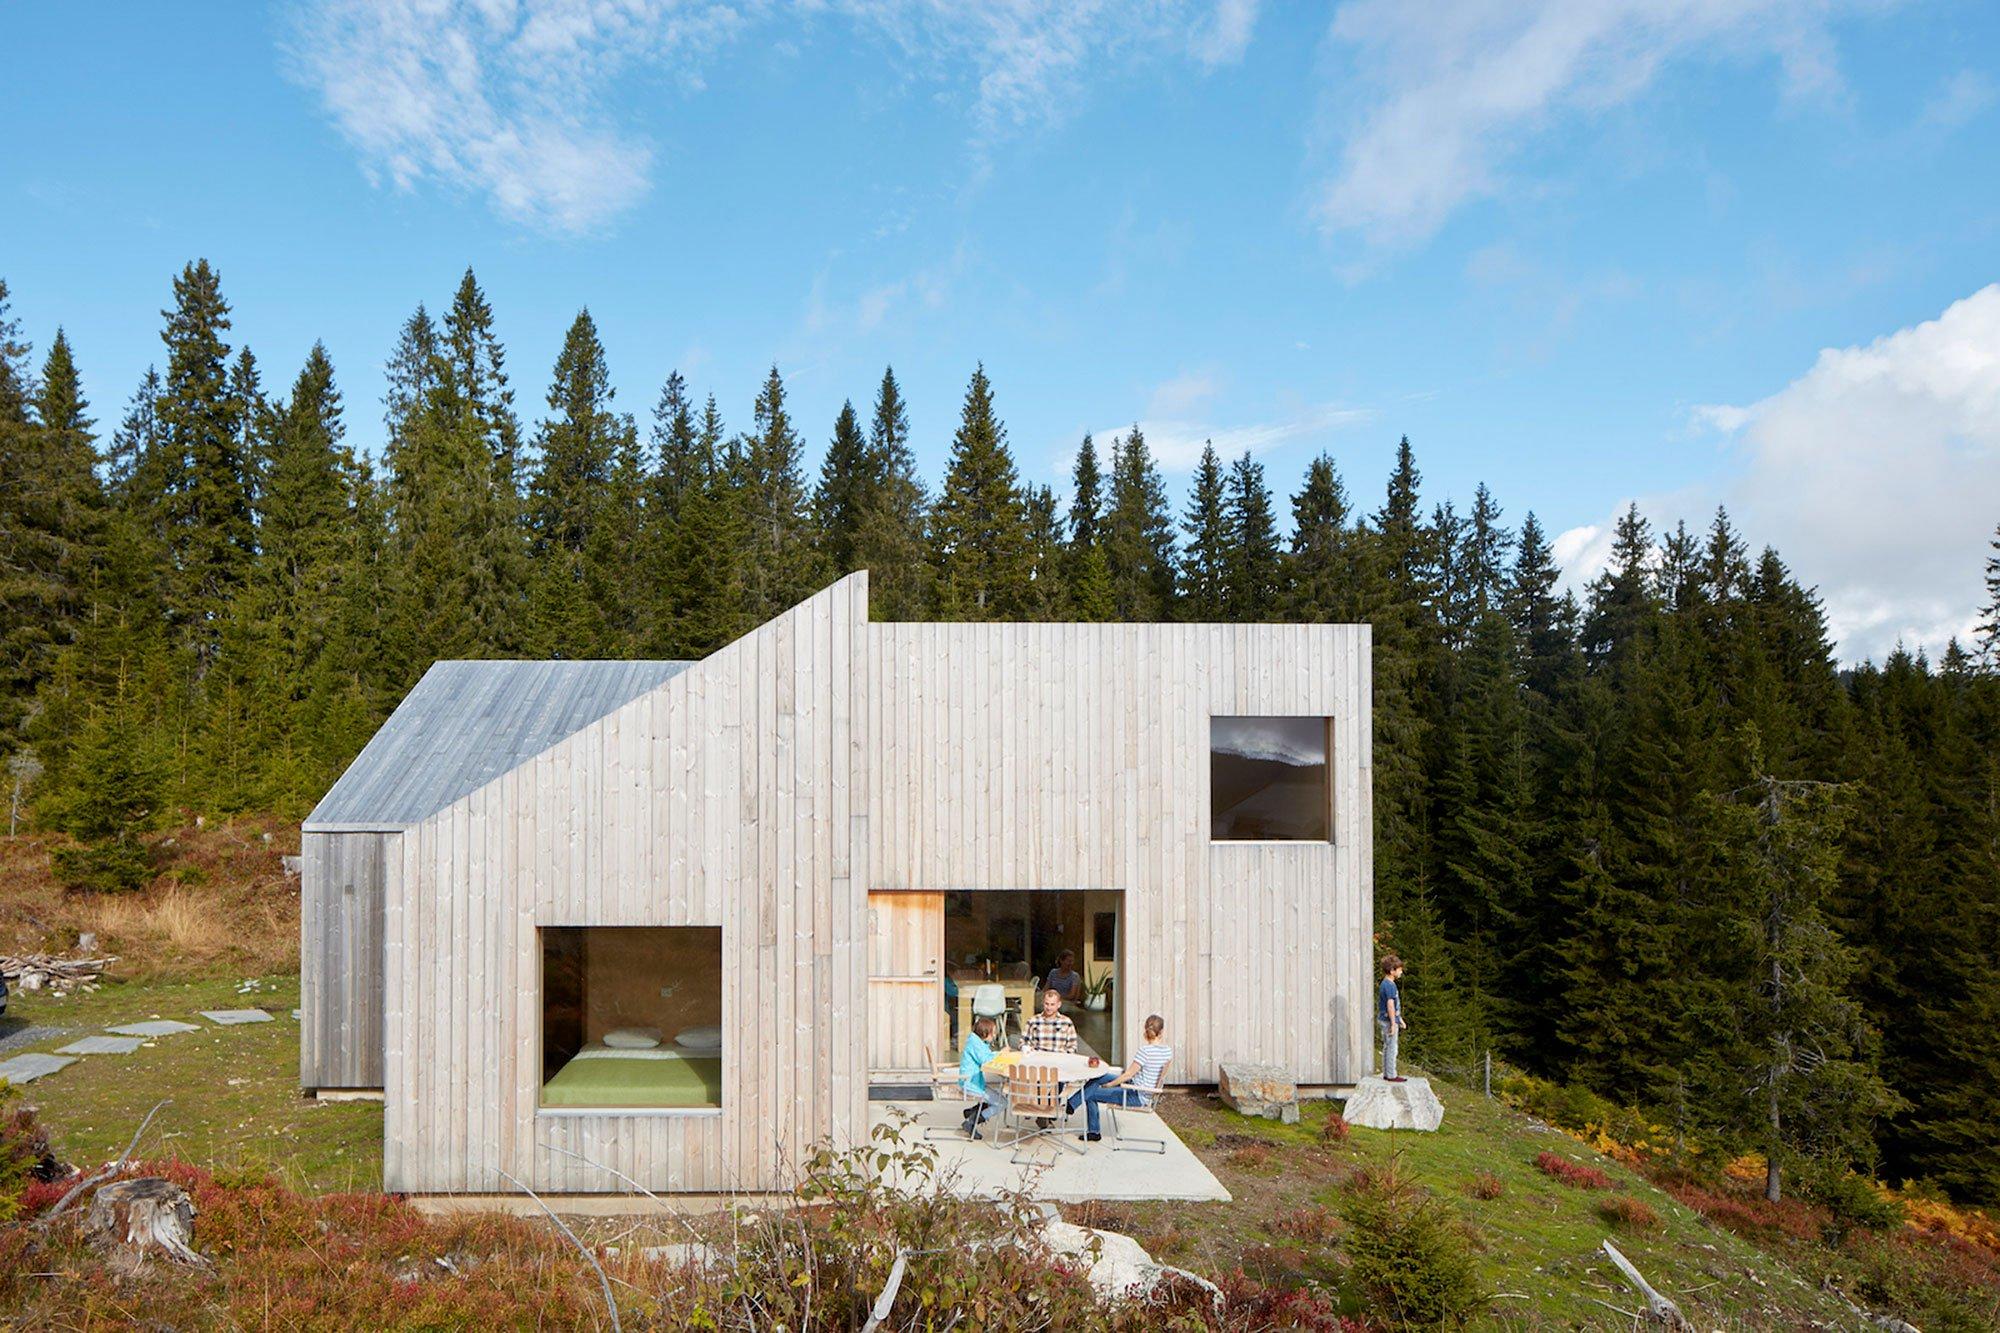 mylla-house-Mork-Ulnes Architects-Bruce-Damonte-04